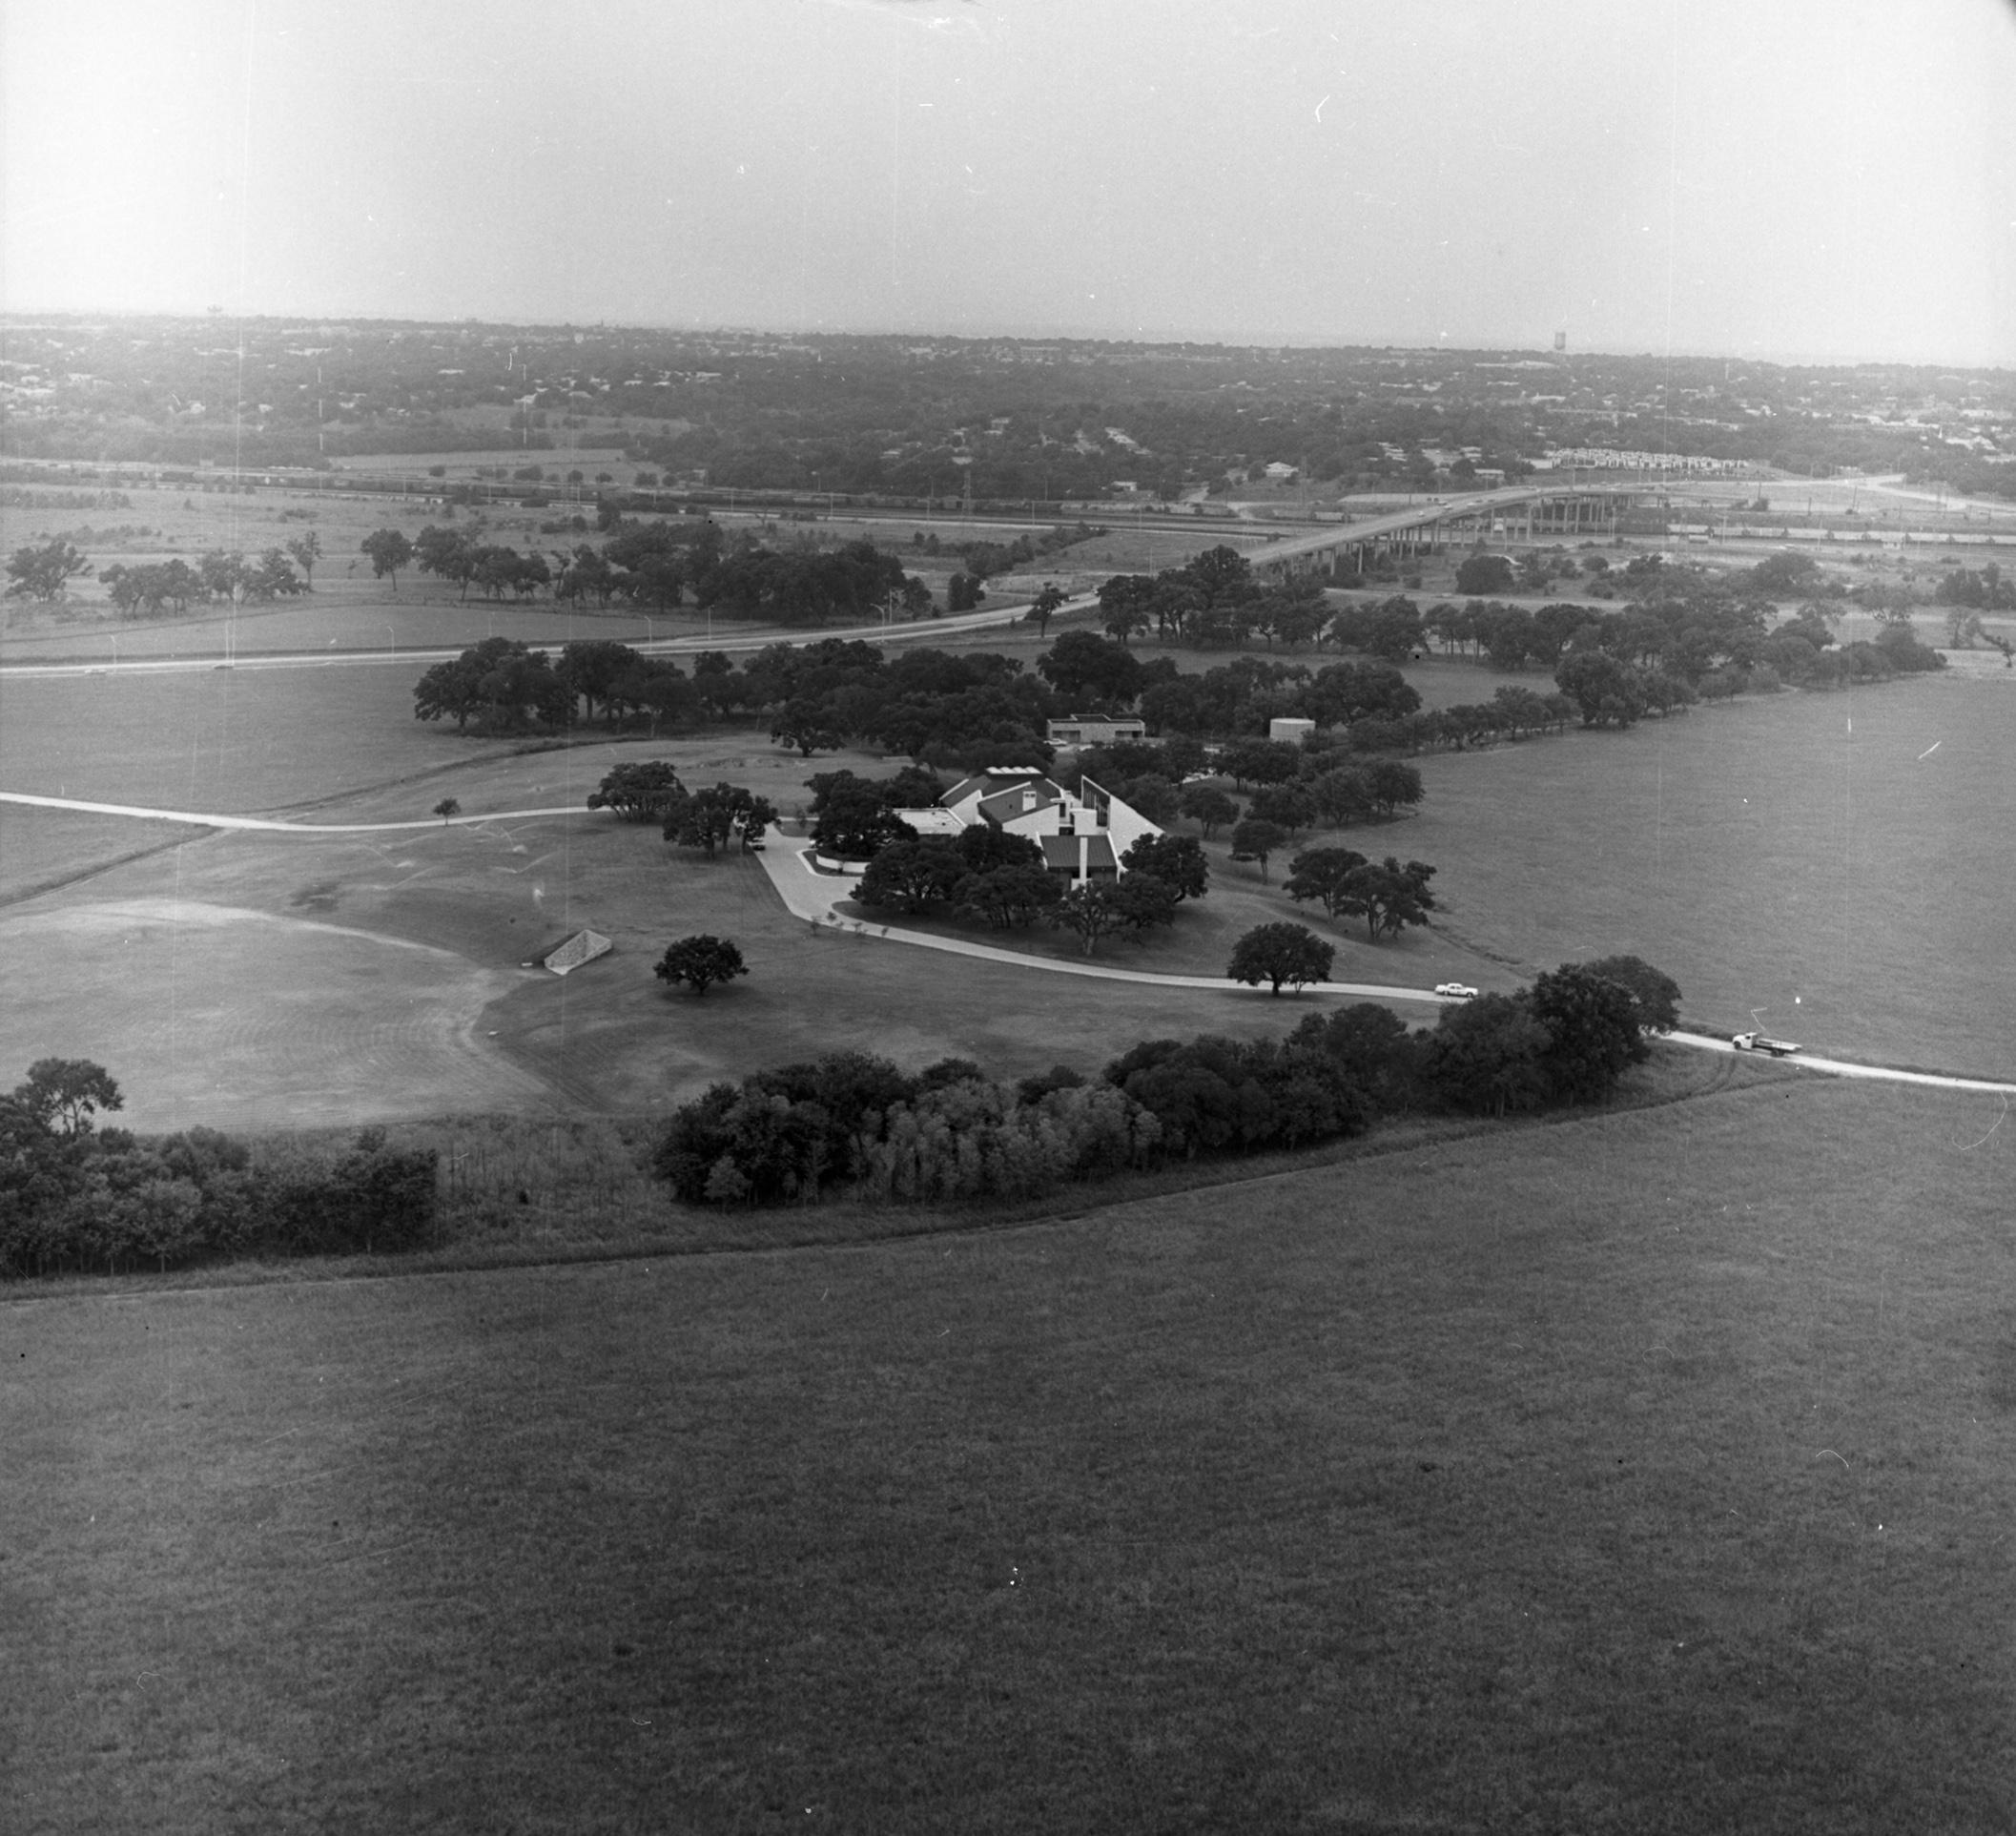 High Aerial Of The 140 Acre Davis Stonegate Mansion 4200 Mockingbird Lane Fort Worth Texas Uta Libraries Digital Gallery